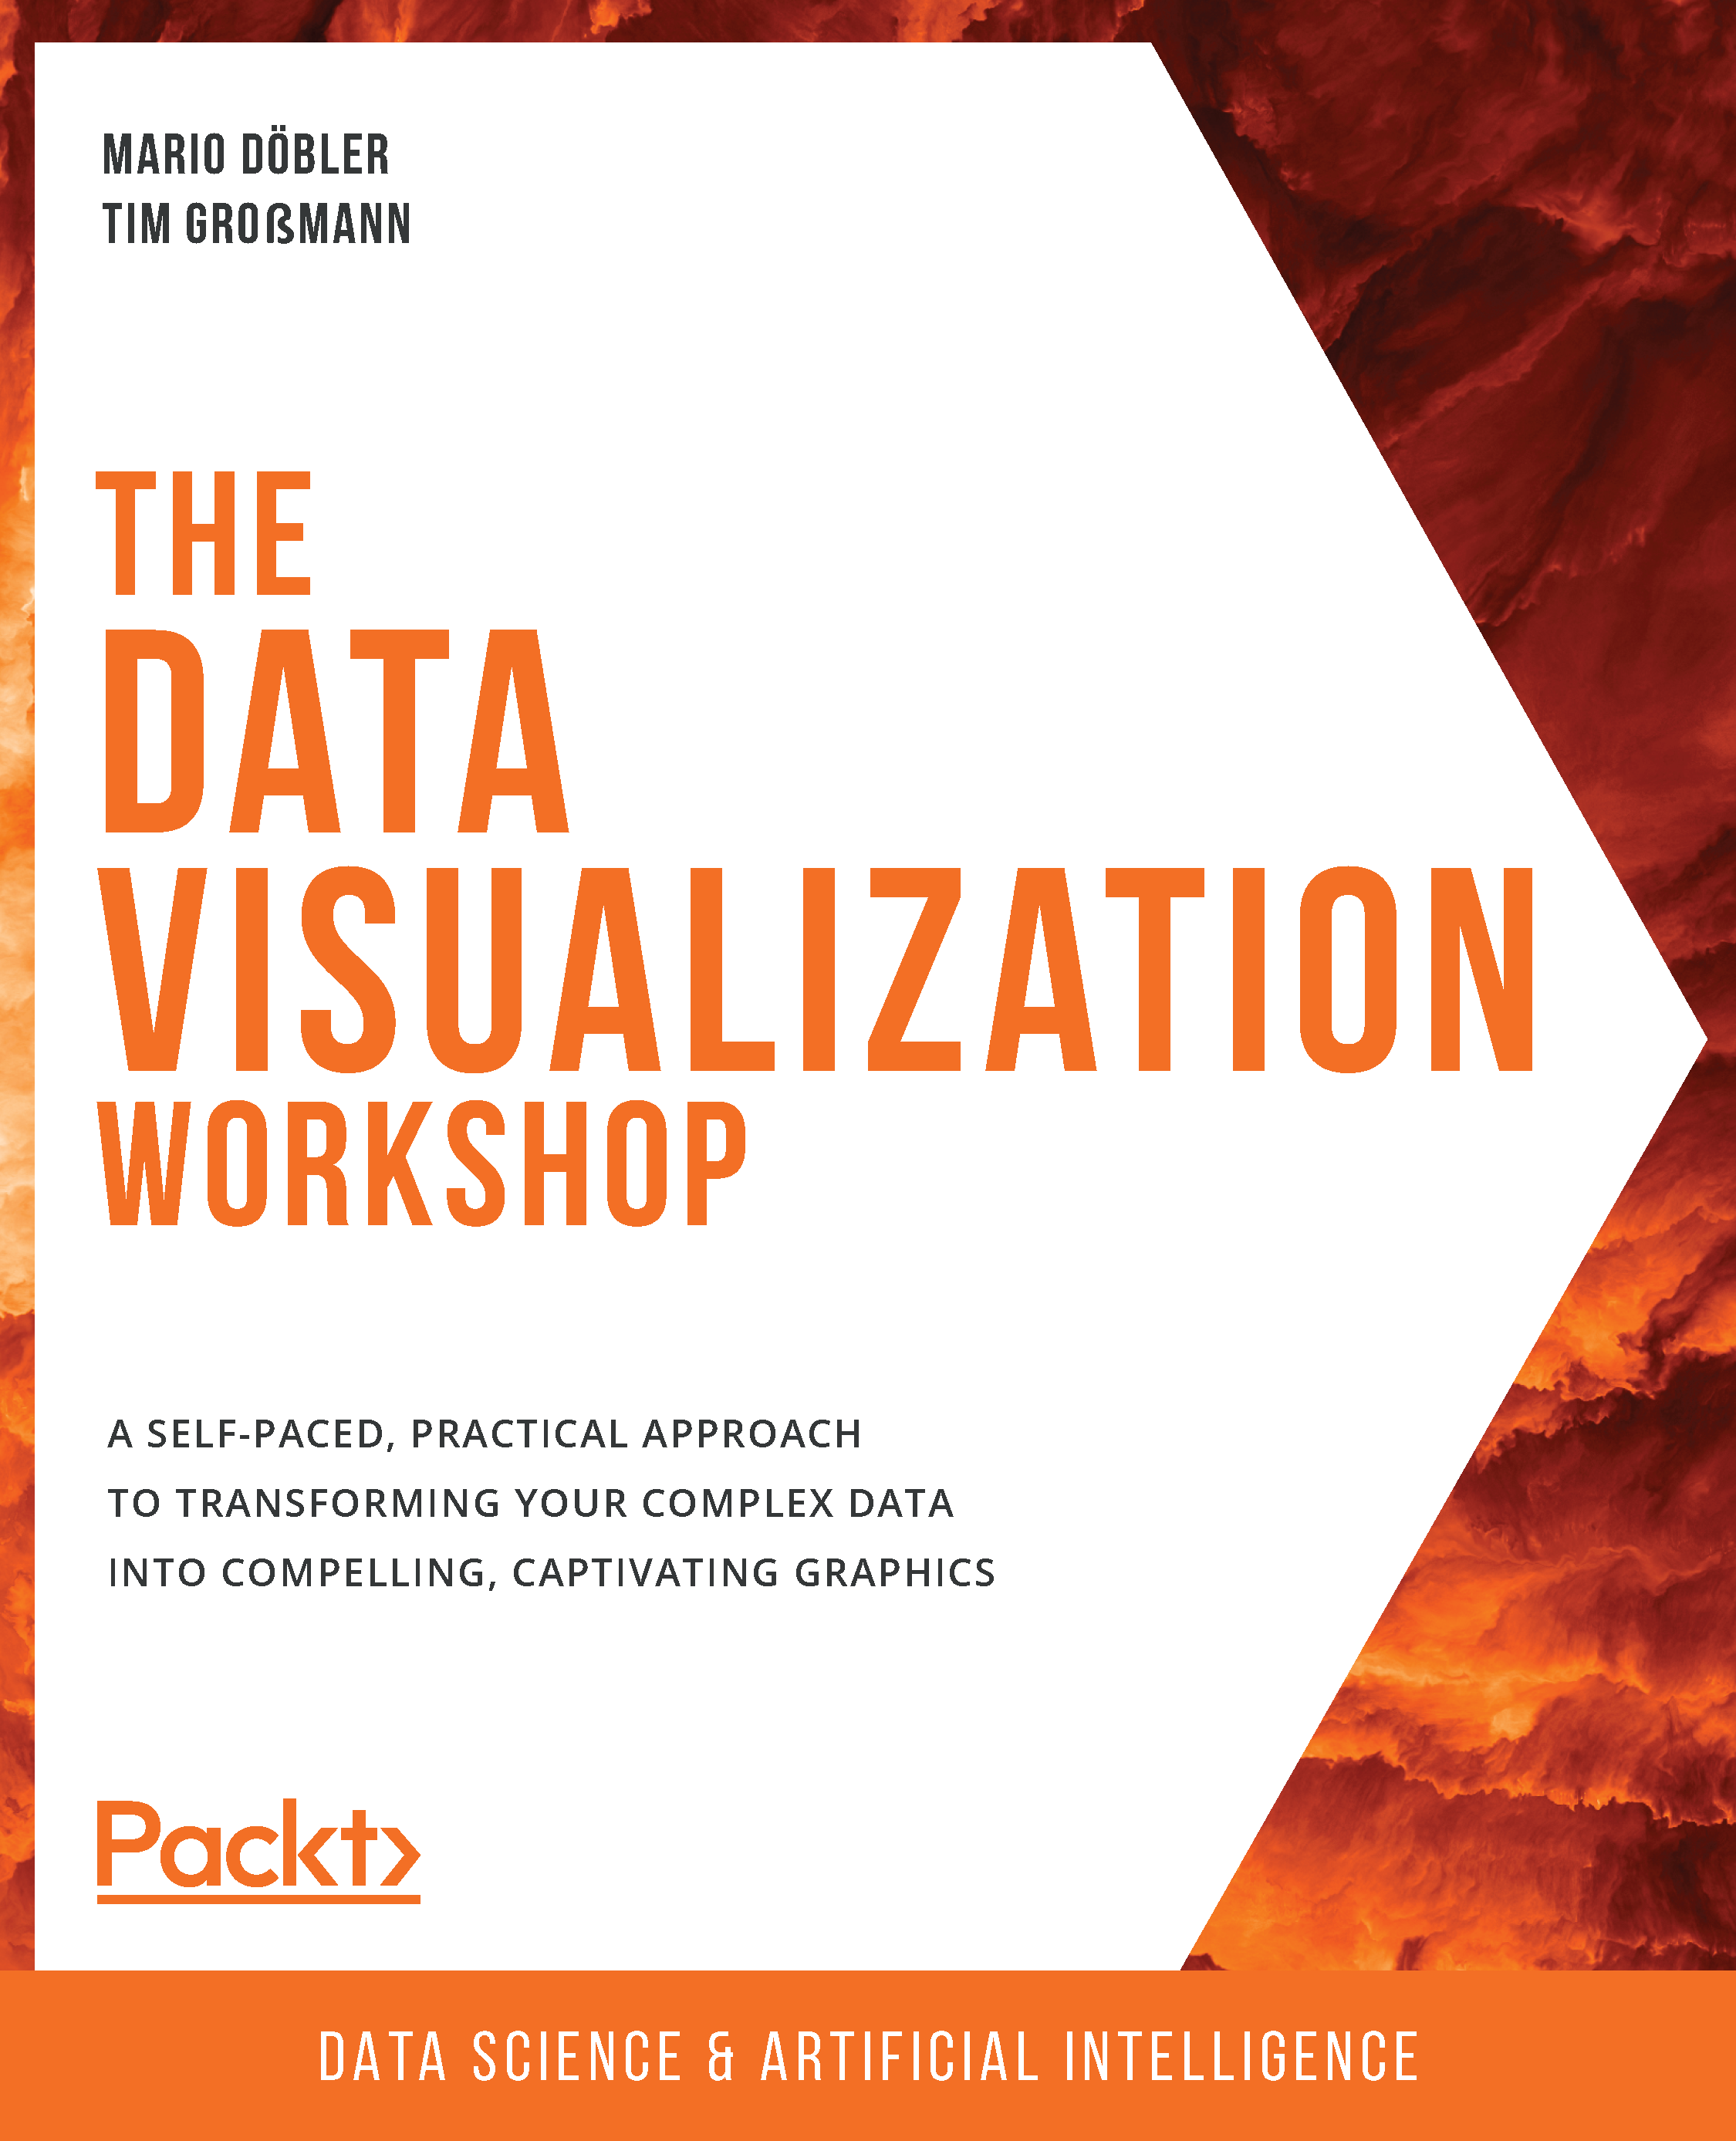 The Data Visualization Workshop